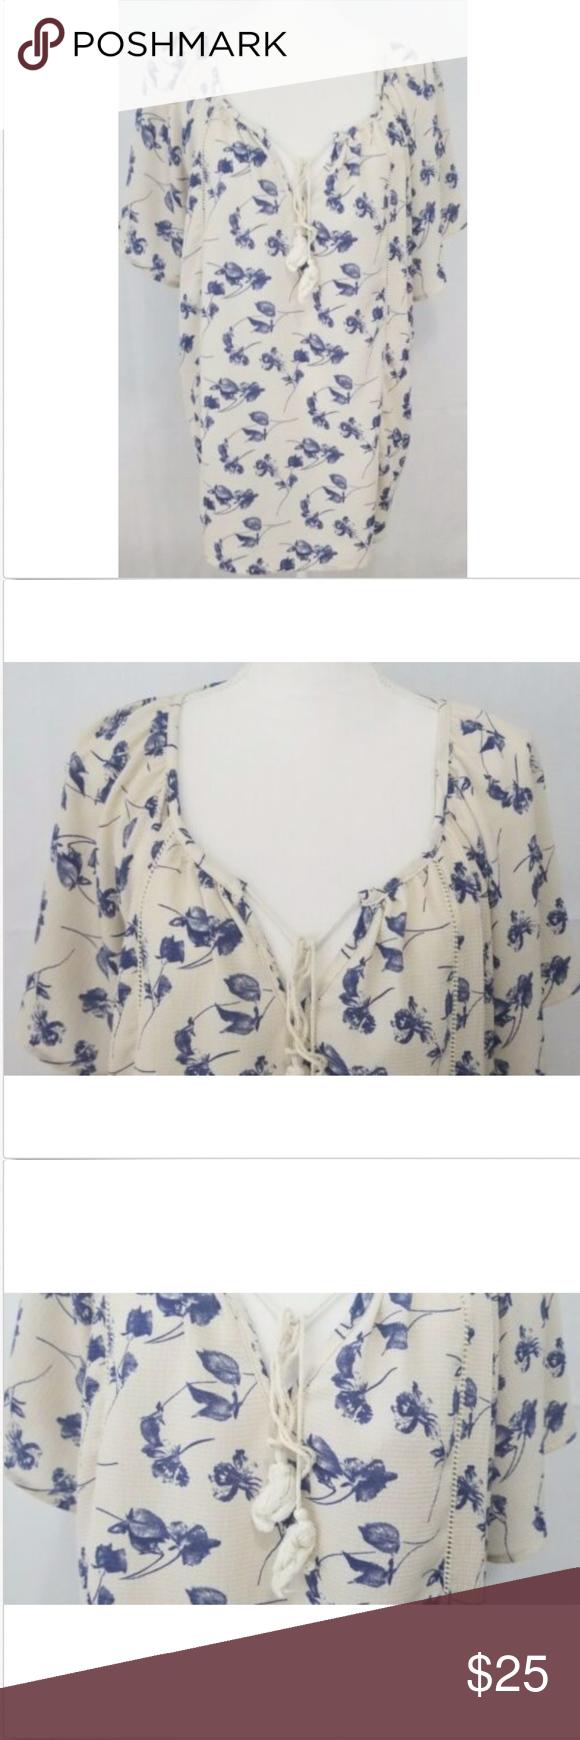 c76b42f367af14 Siren Lily Women's Top Plus 2X Shirt Casual Blouse Siren Lily Women's  blouse Plus Top Shirt